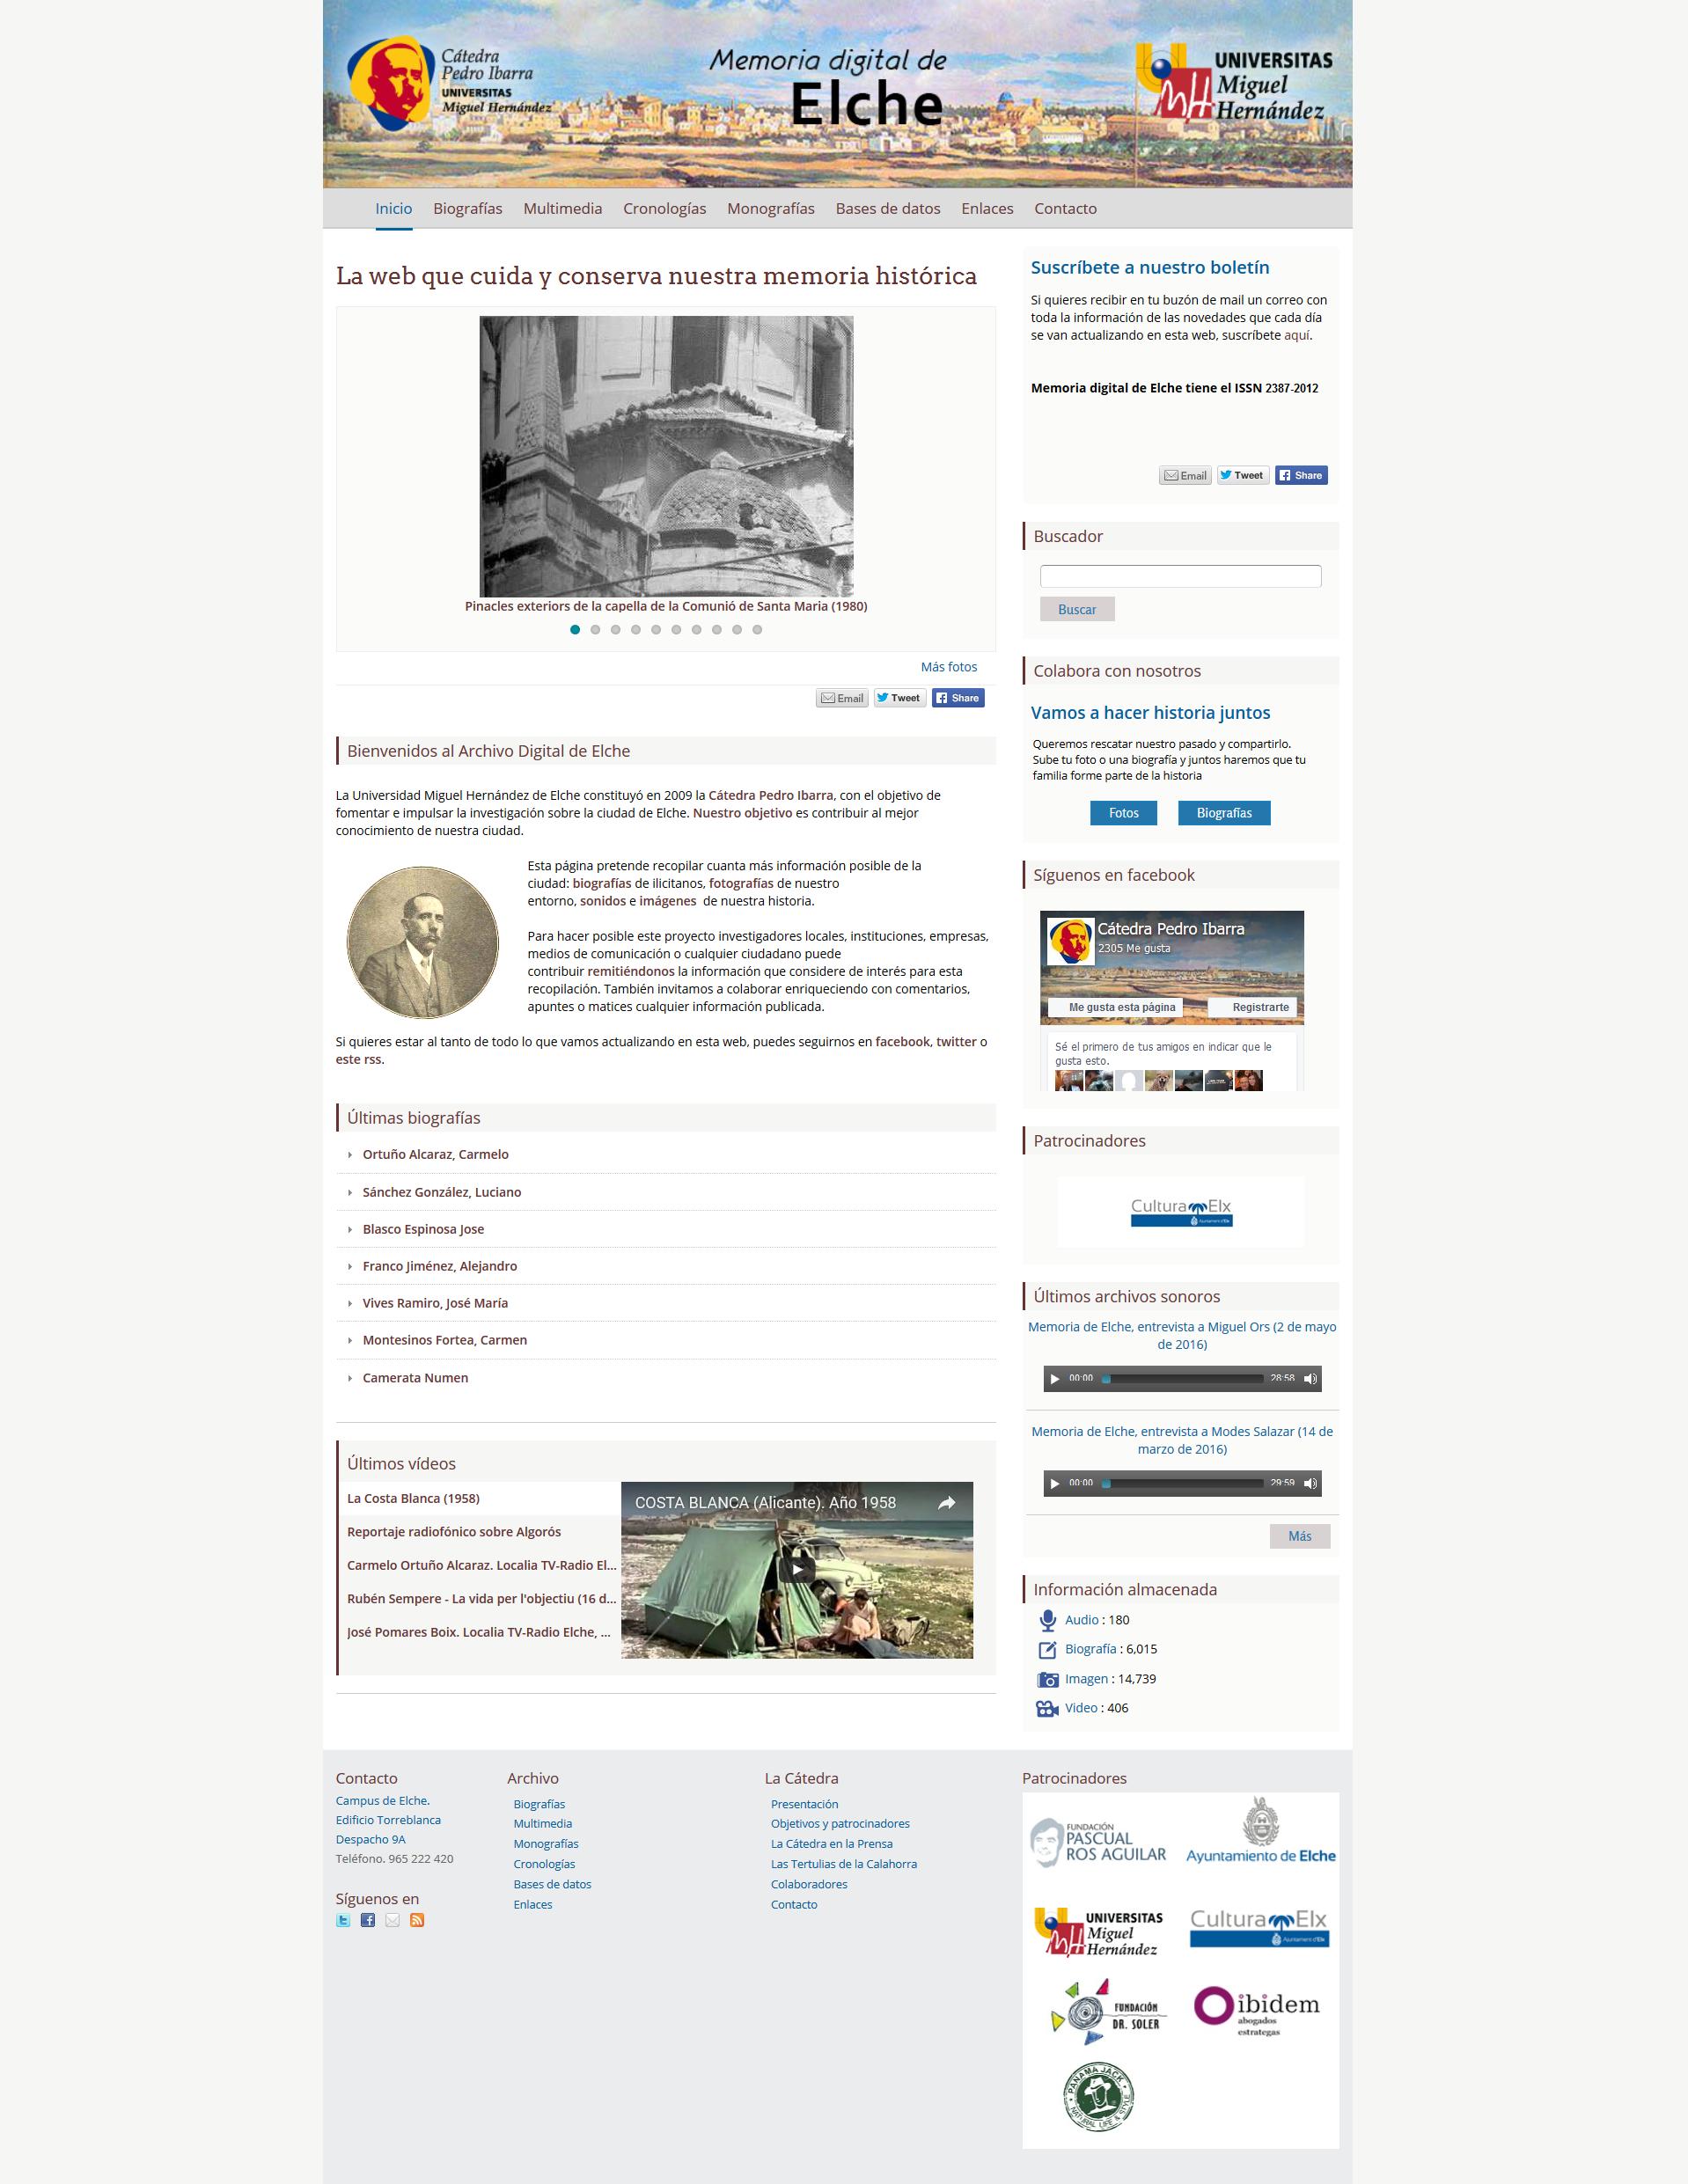 Modificaciones diseño web drupal elche.me